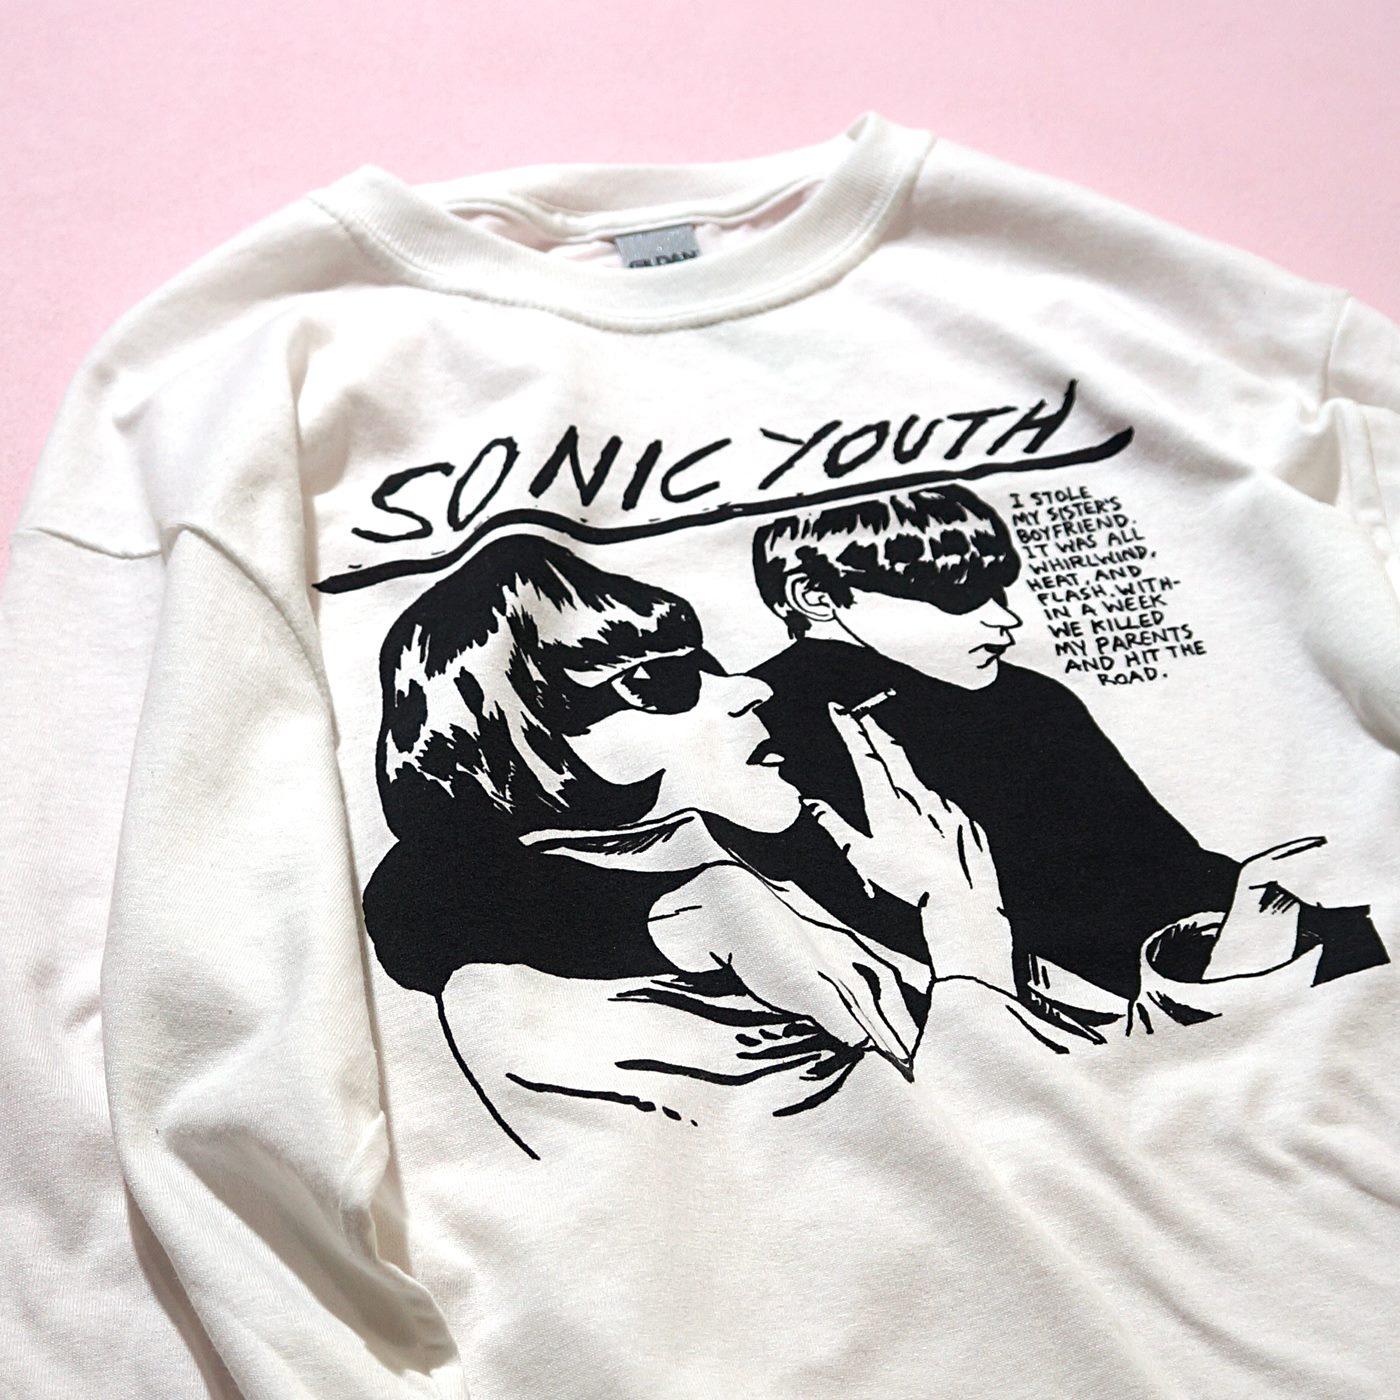 SONIC YOUTH ロングスリーブTシャツ Goo-White